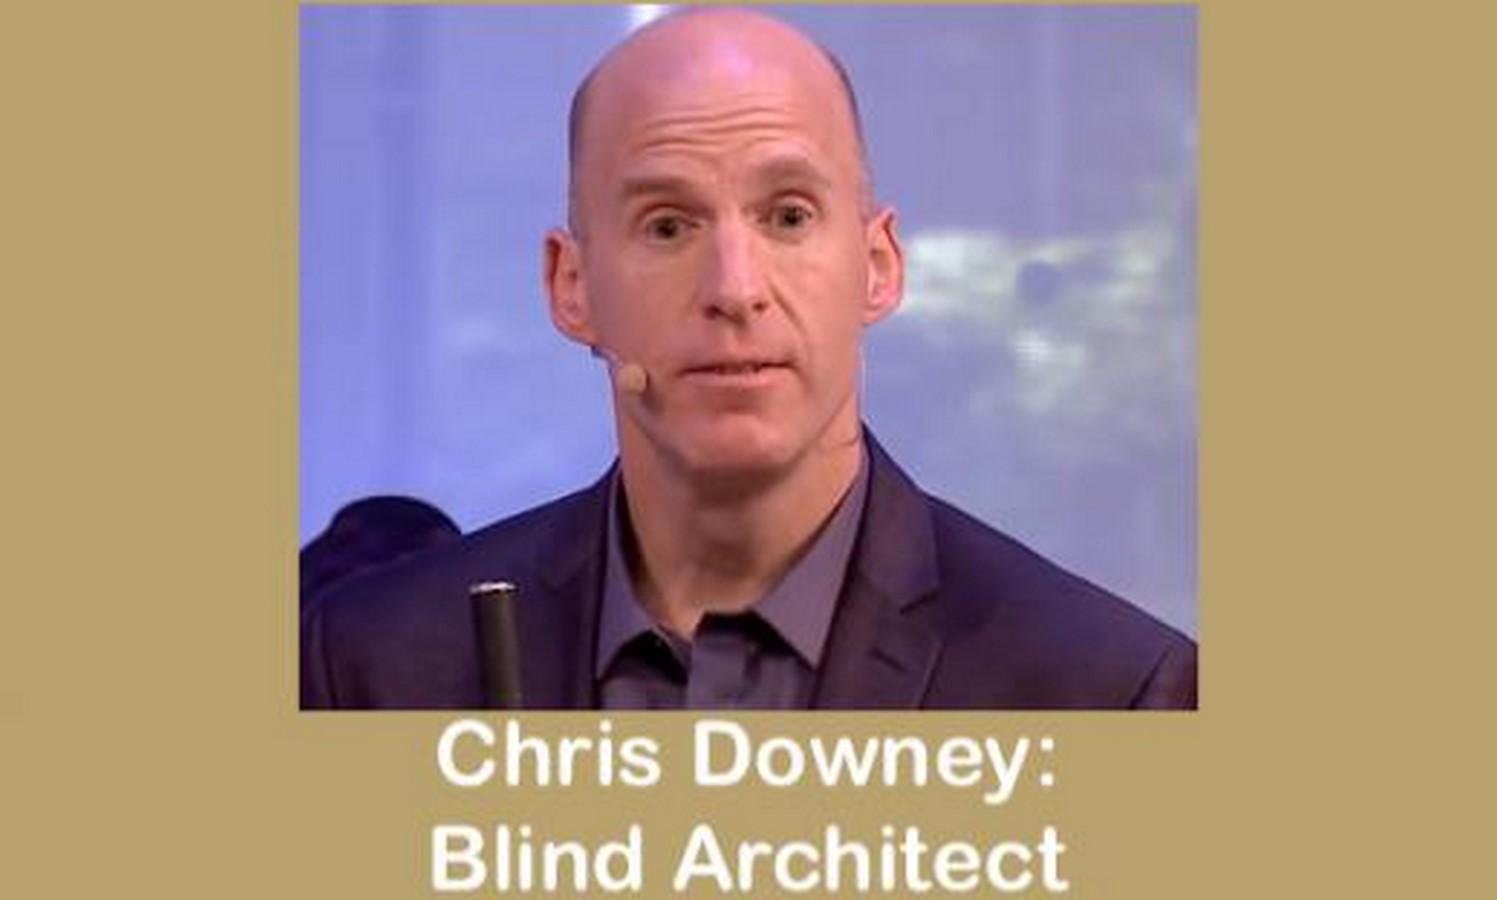 Chris Downey: The blind Architect - Sheet1